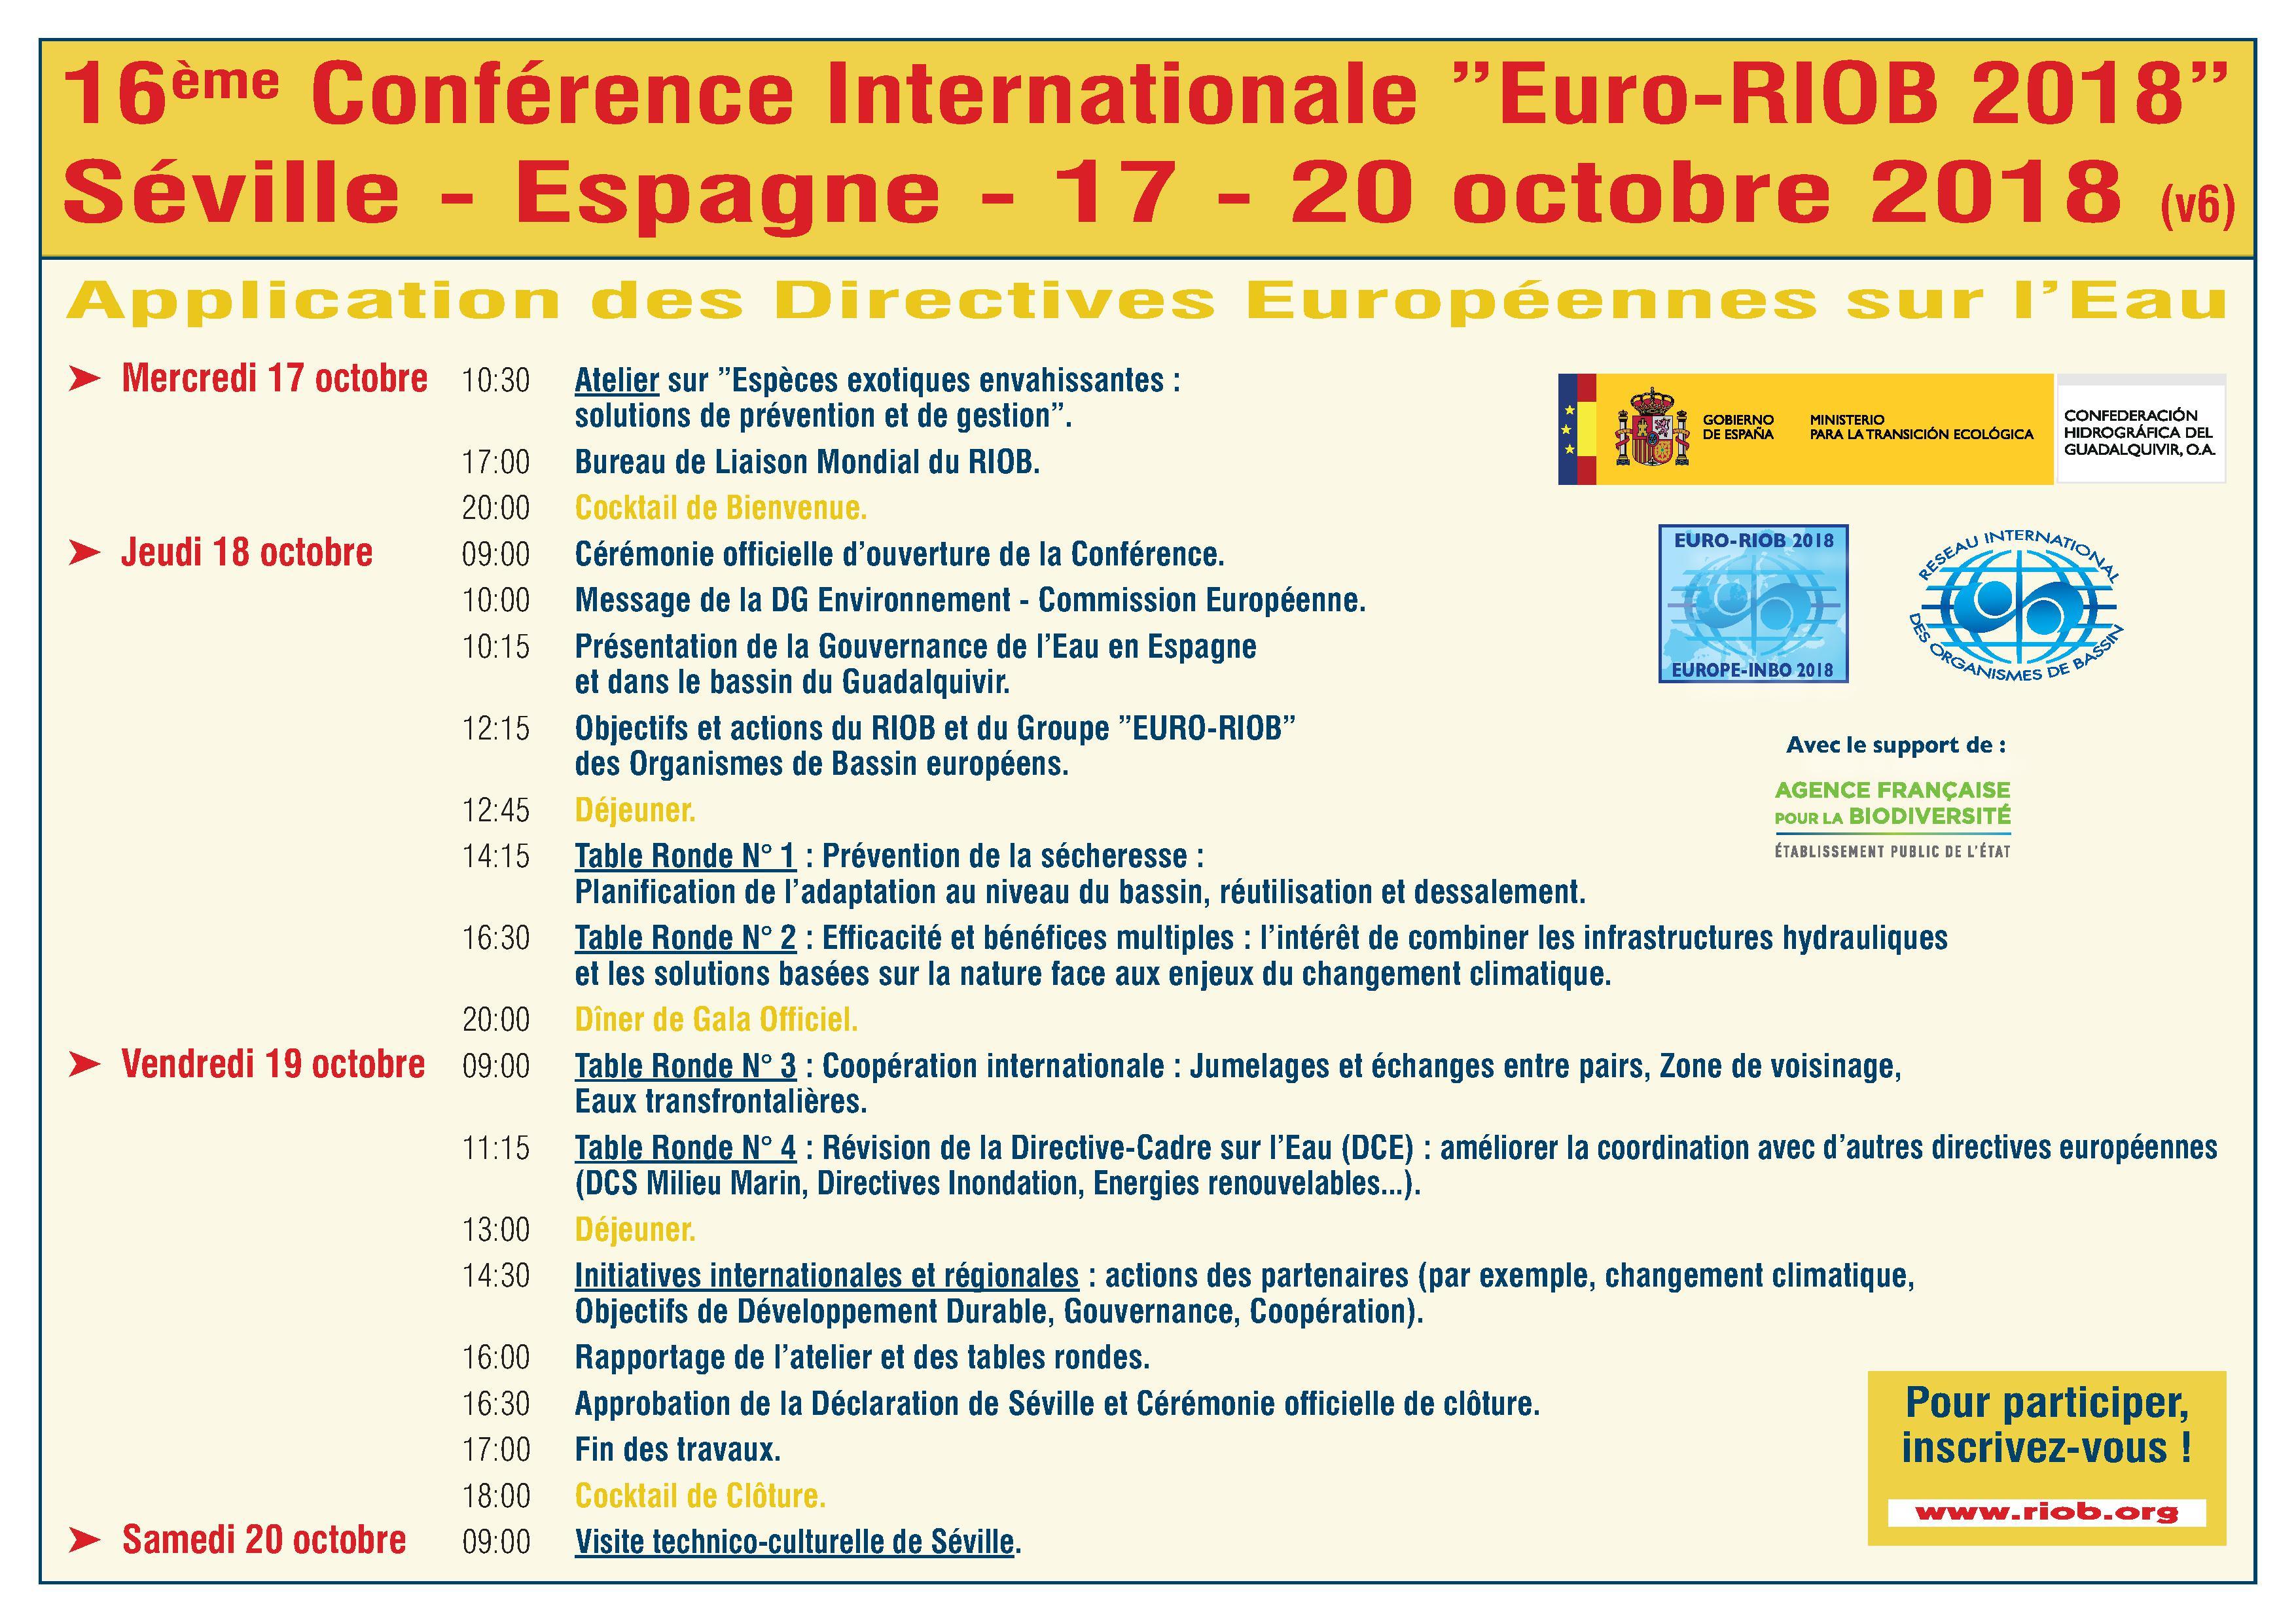 Programme EURO-RIOB 2018 V6_0.jpg